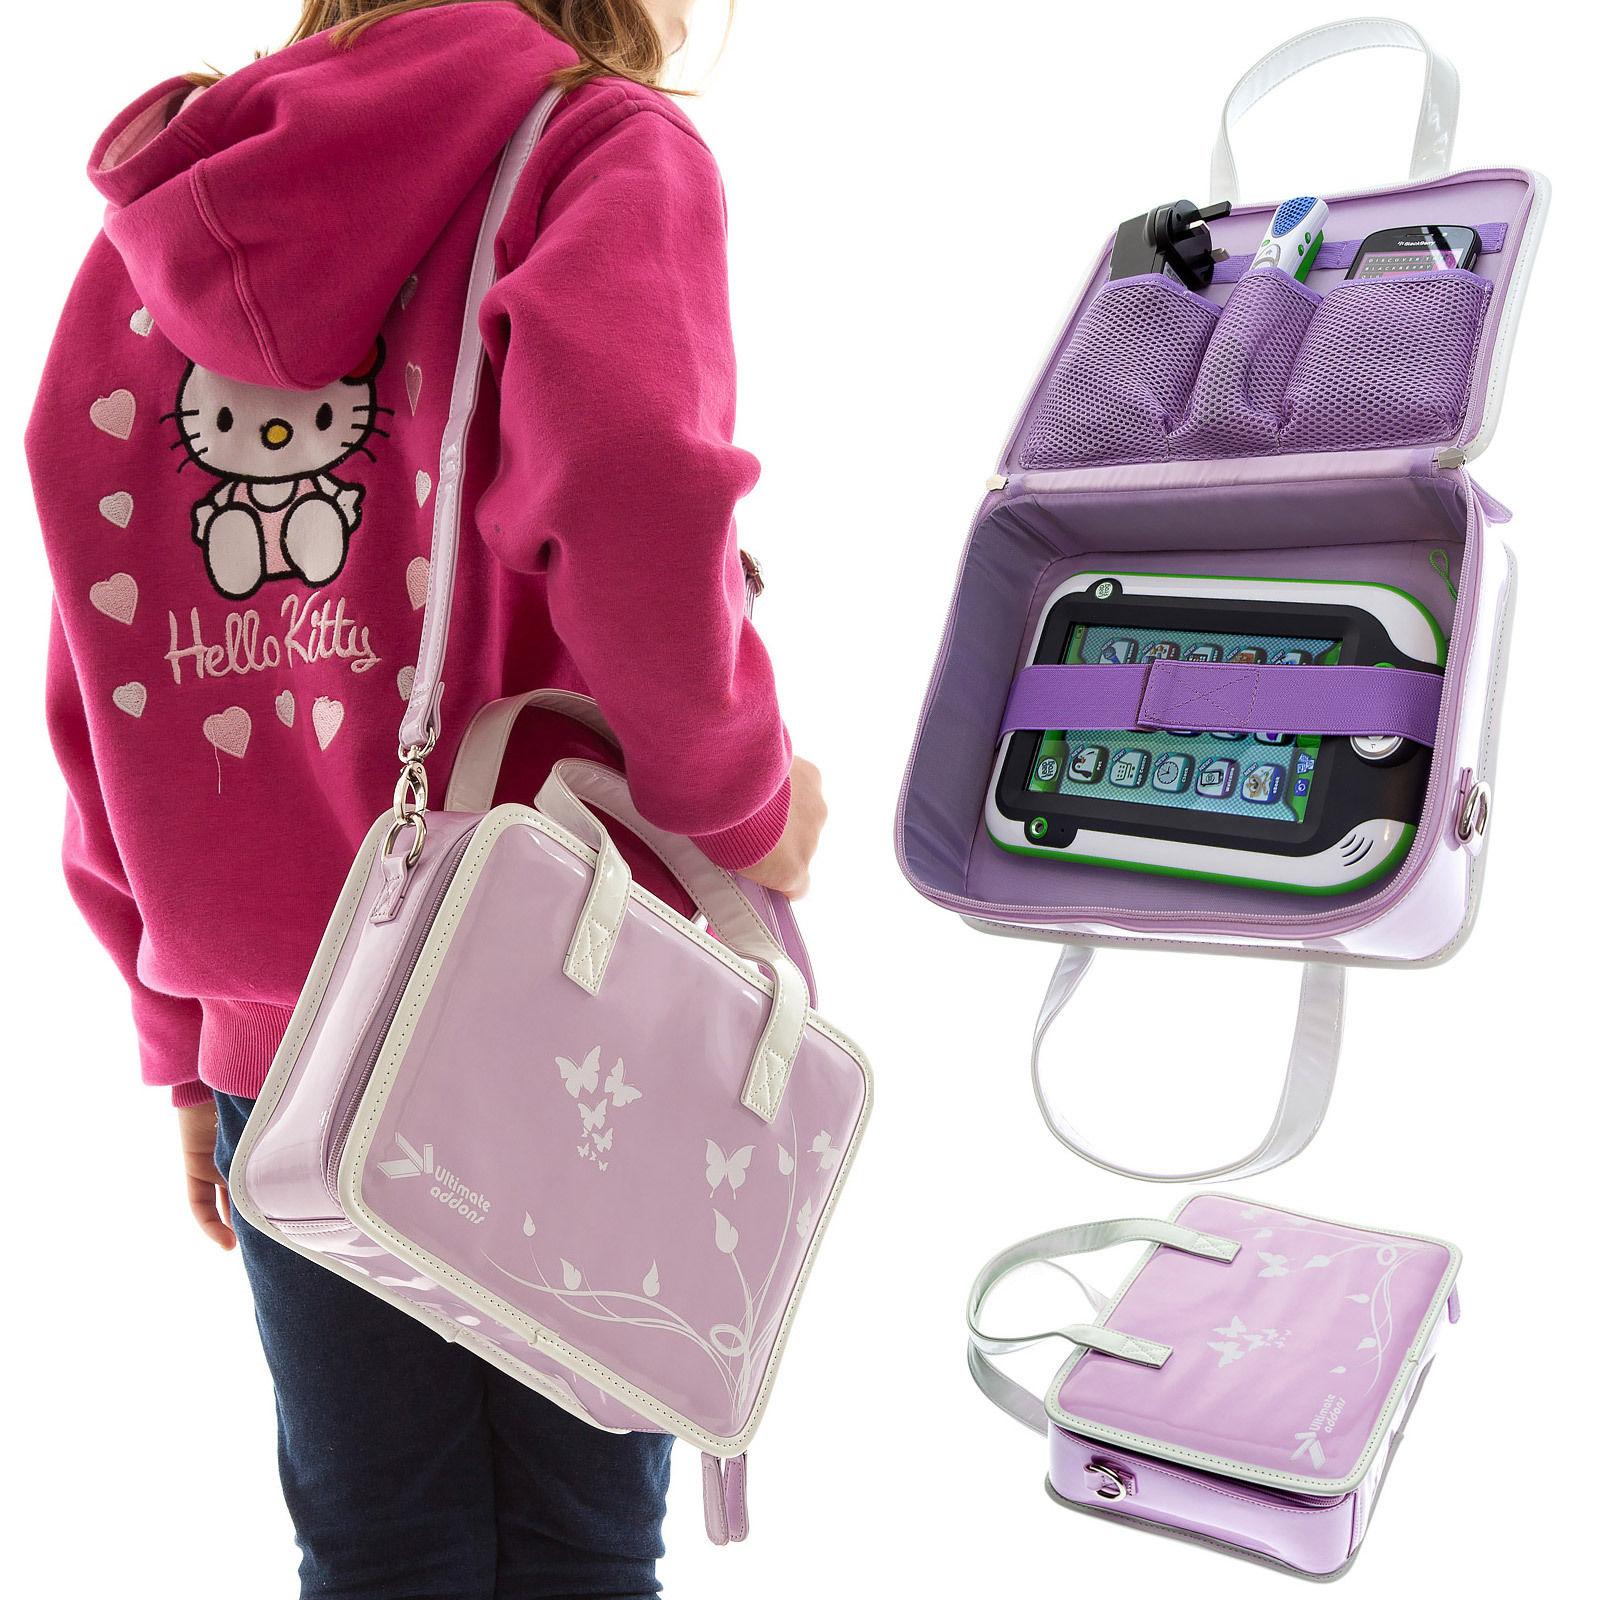 Kids Storage Case Bag Girls Handbag Fits Vtech Innotab 3